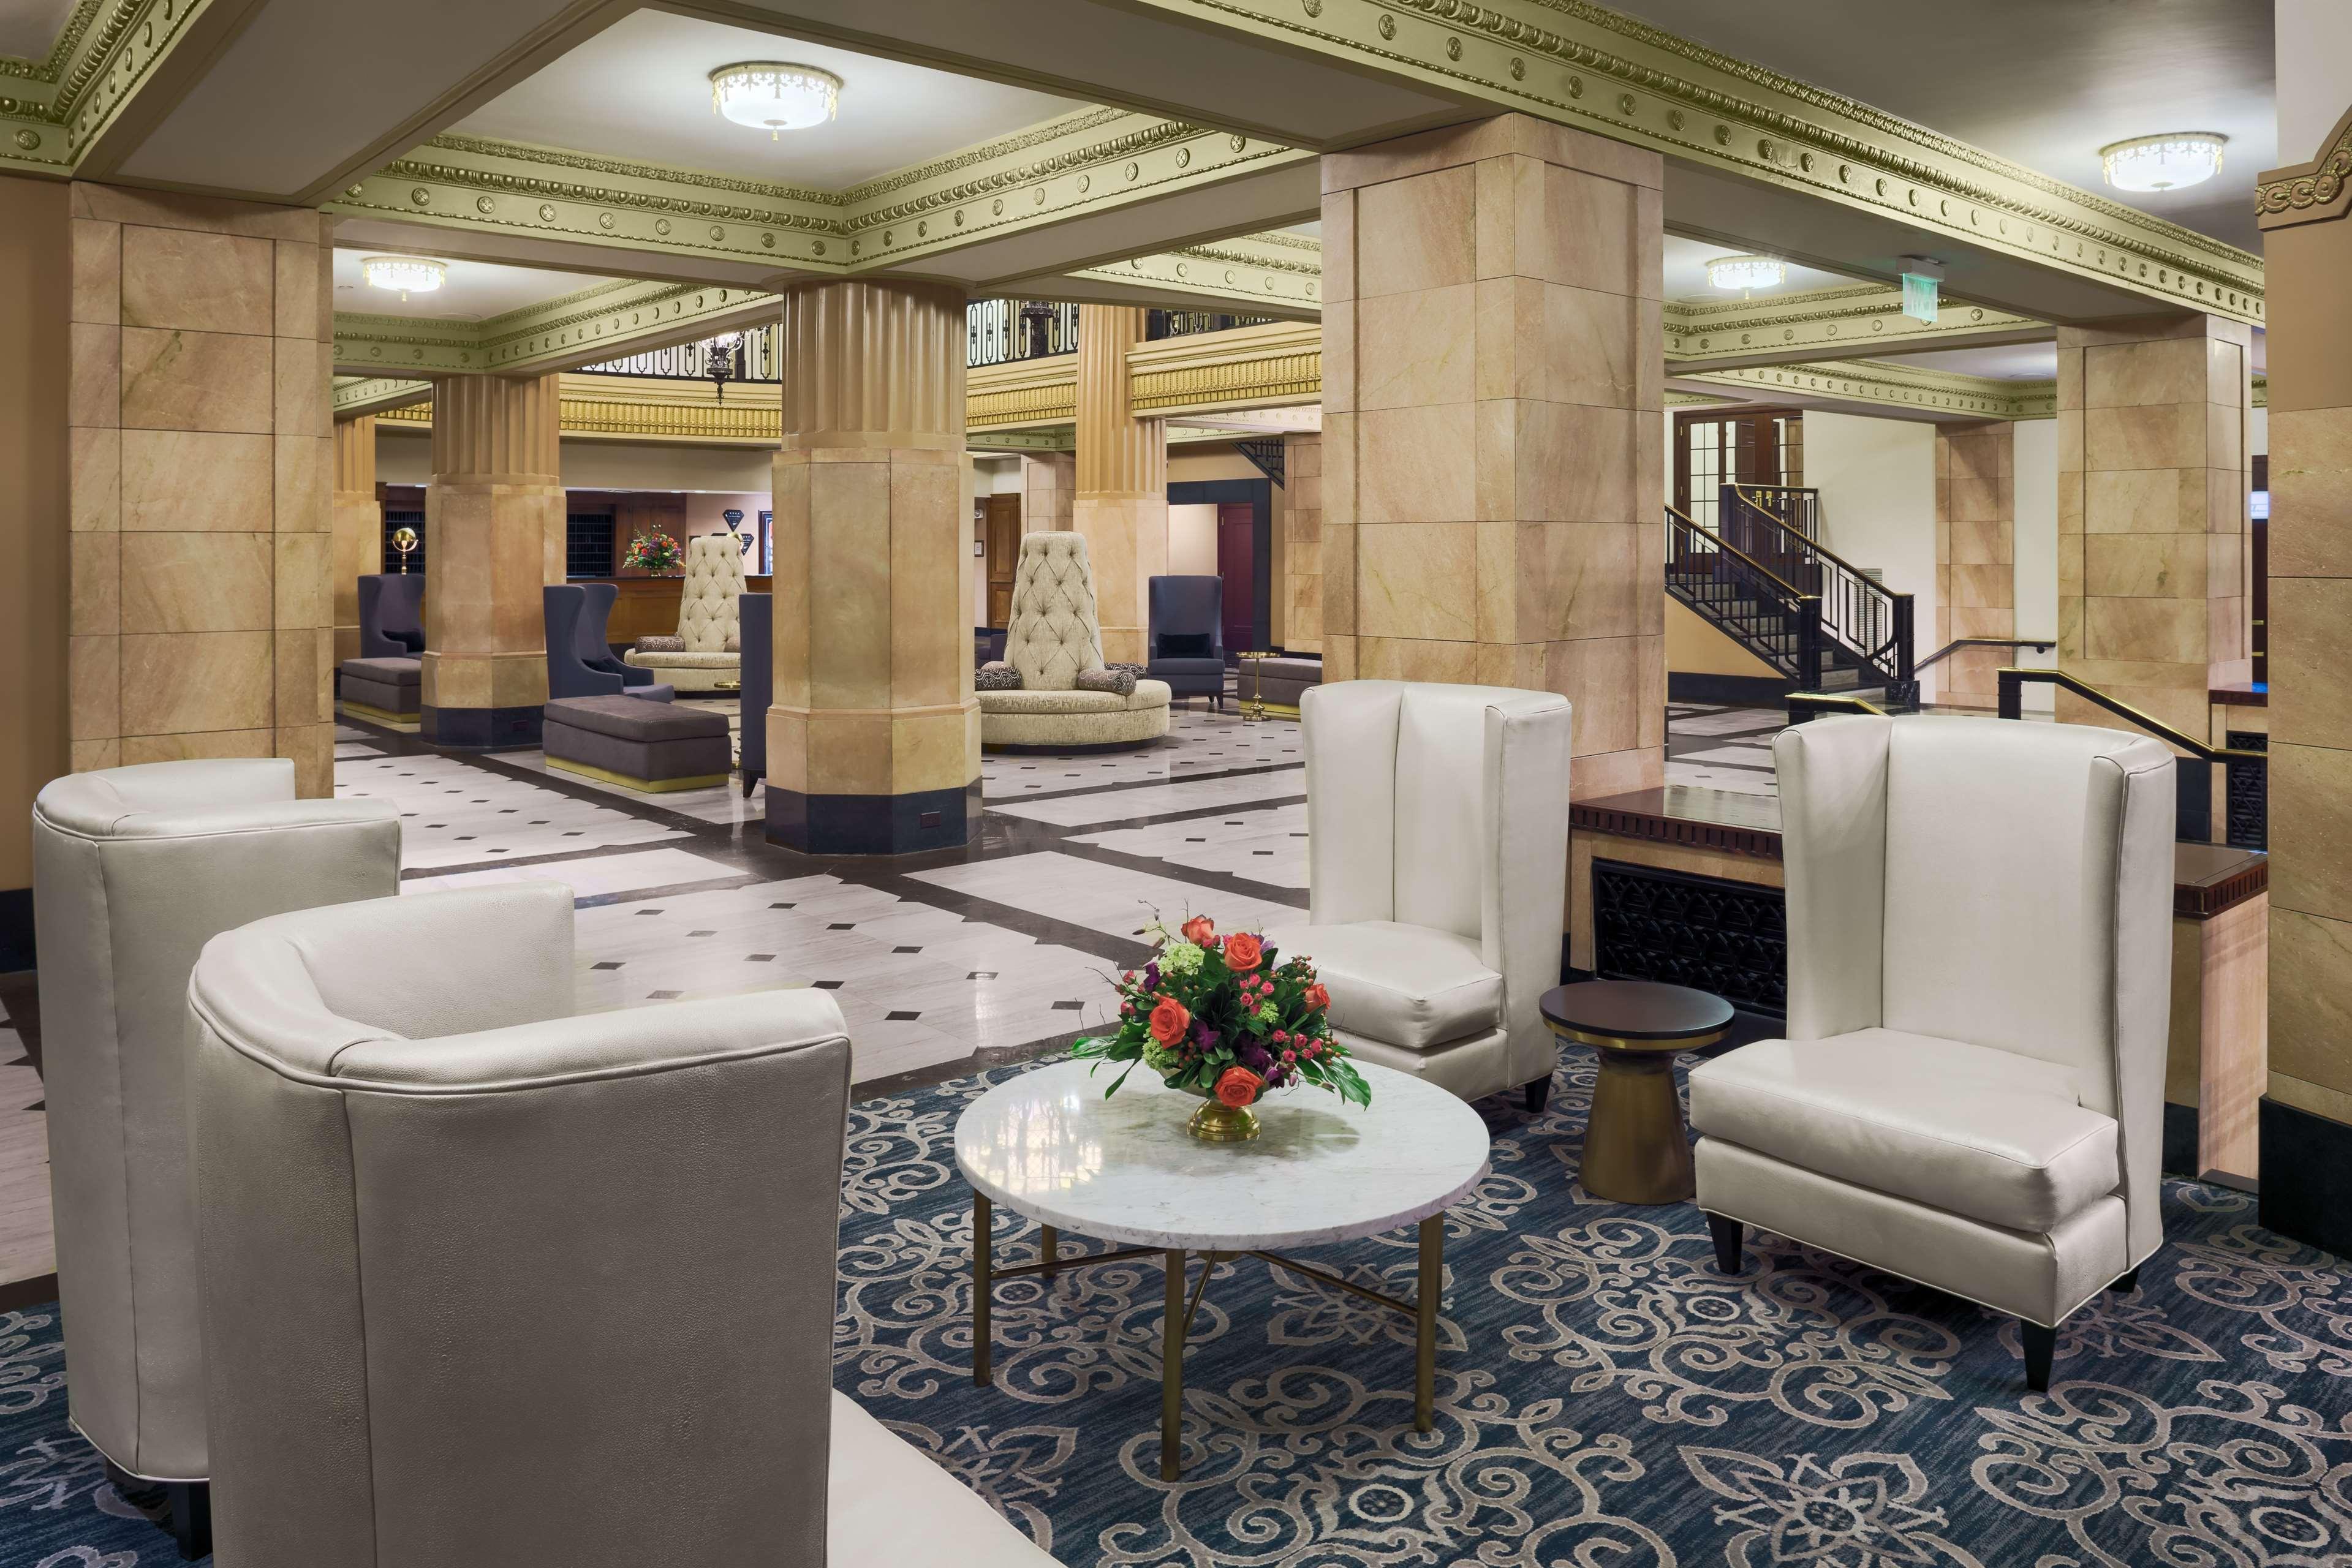 Hilton President Kansas City image 3